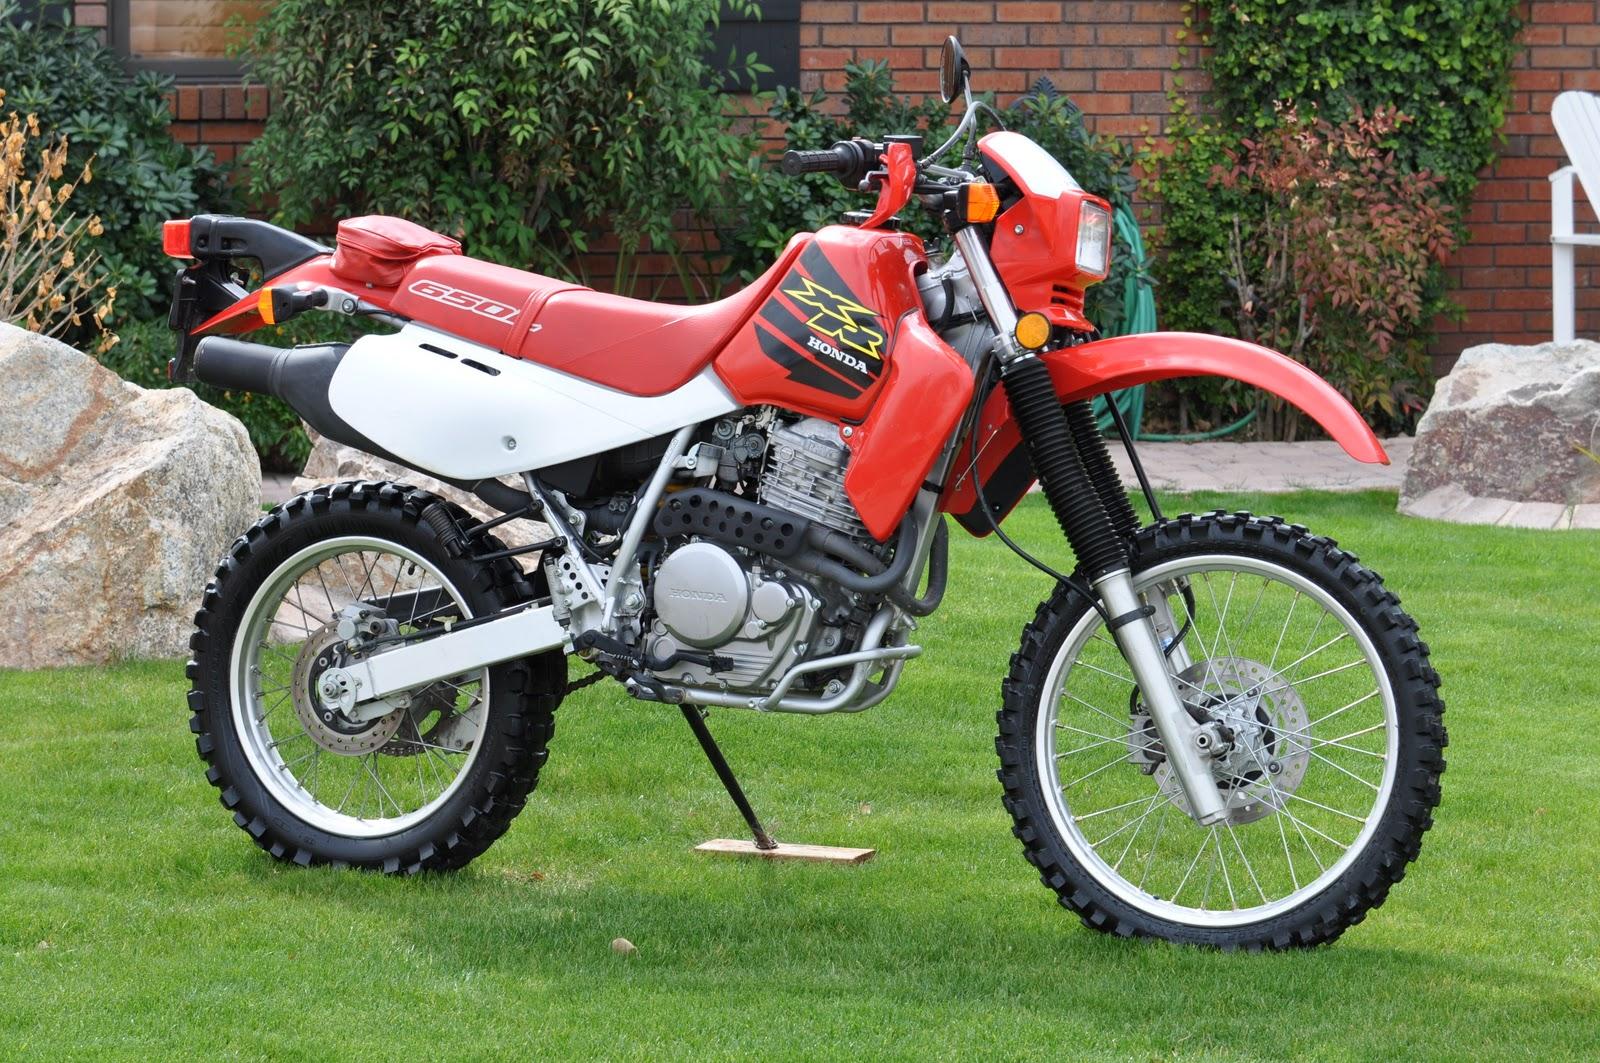 XR650L for sale in AZ: Pictures - 2000 Honda XR650L ...